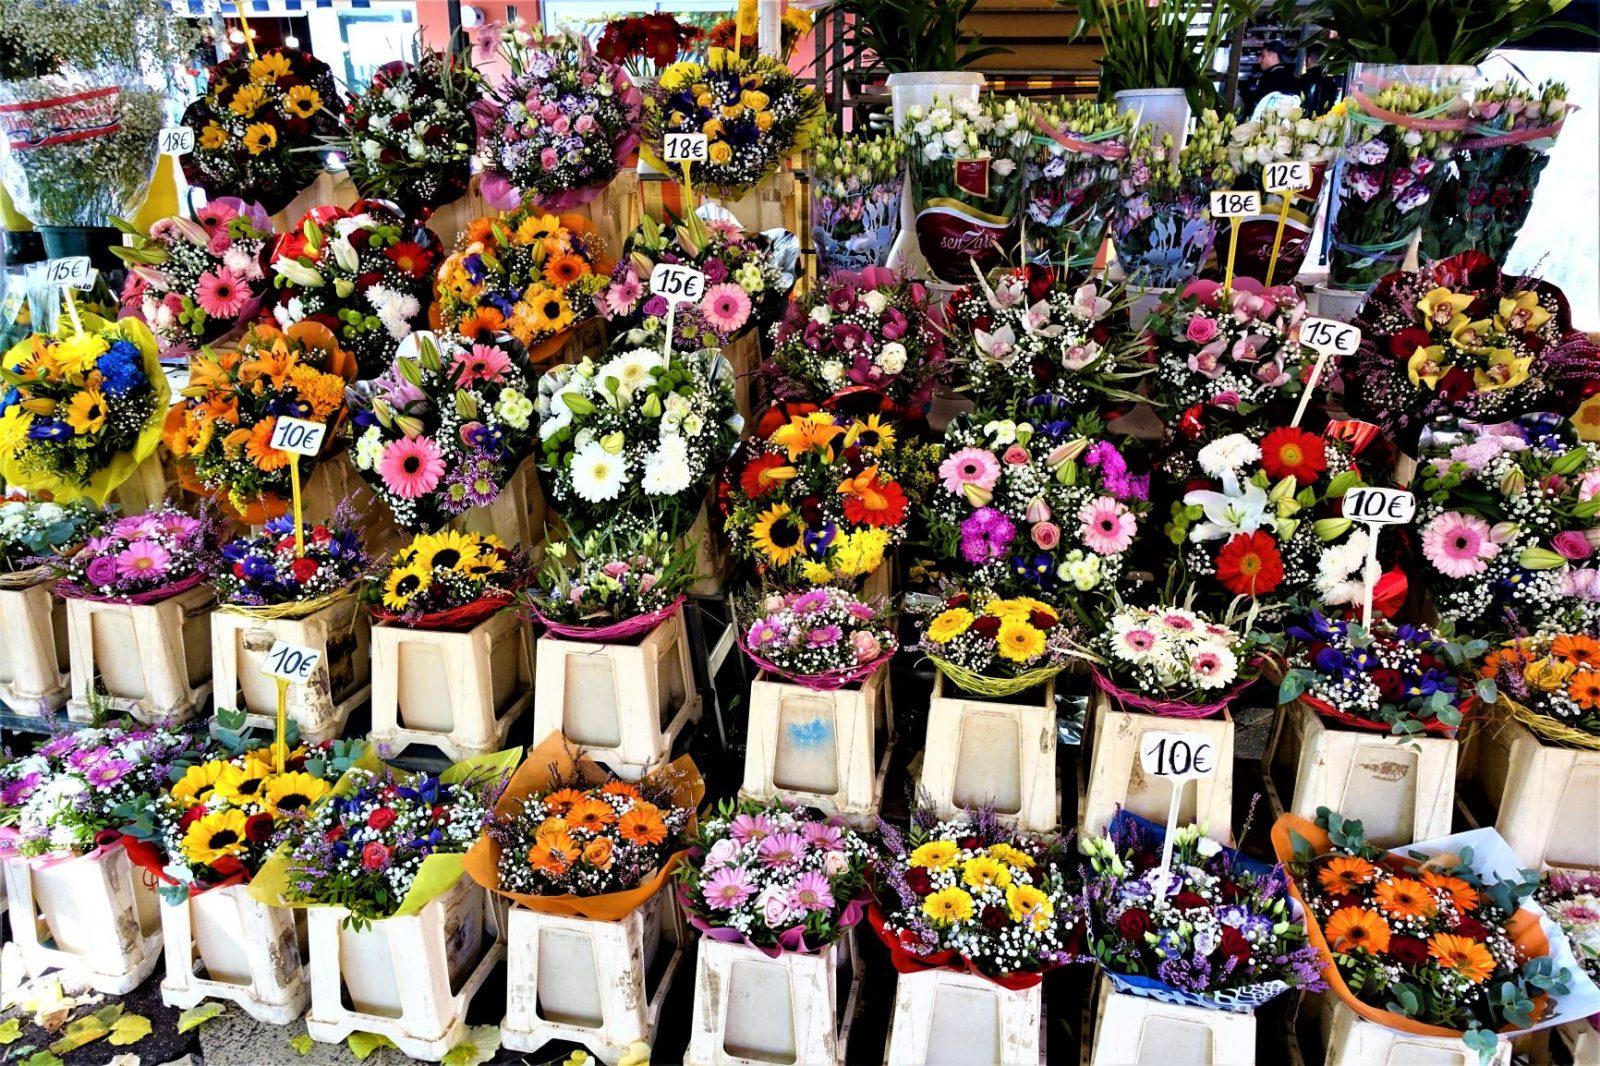 Blomstermarkedet i Nice